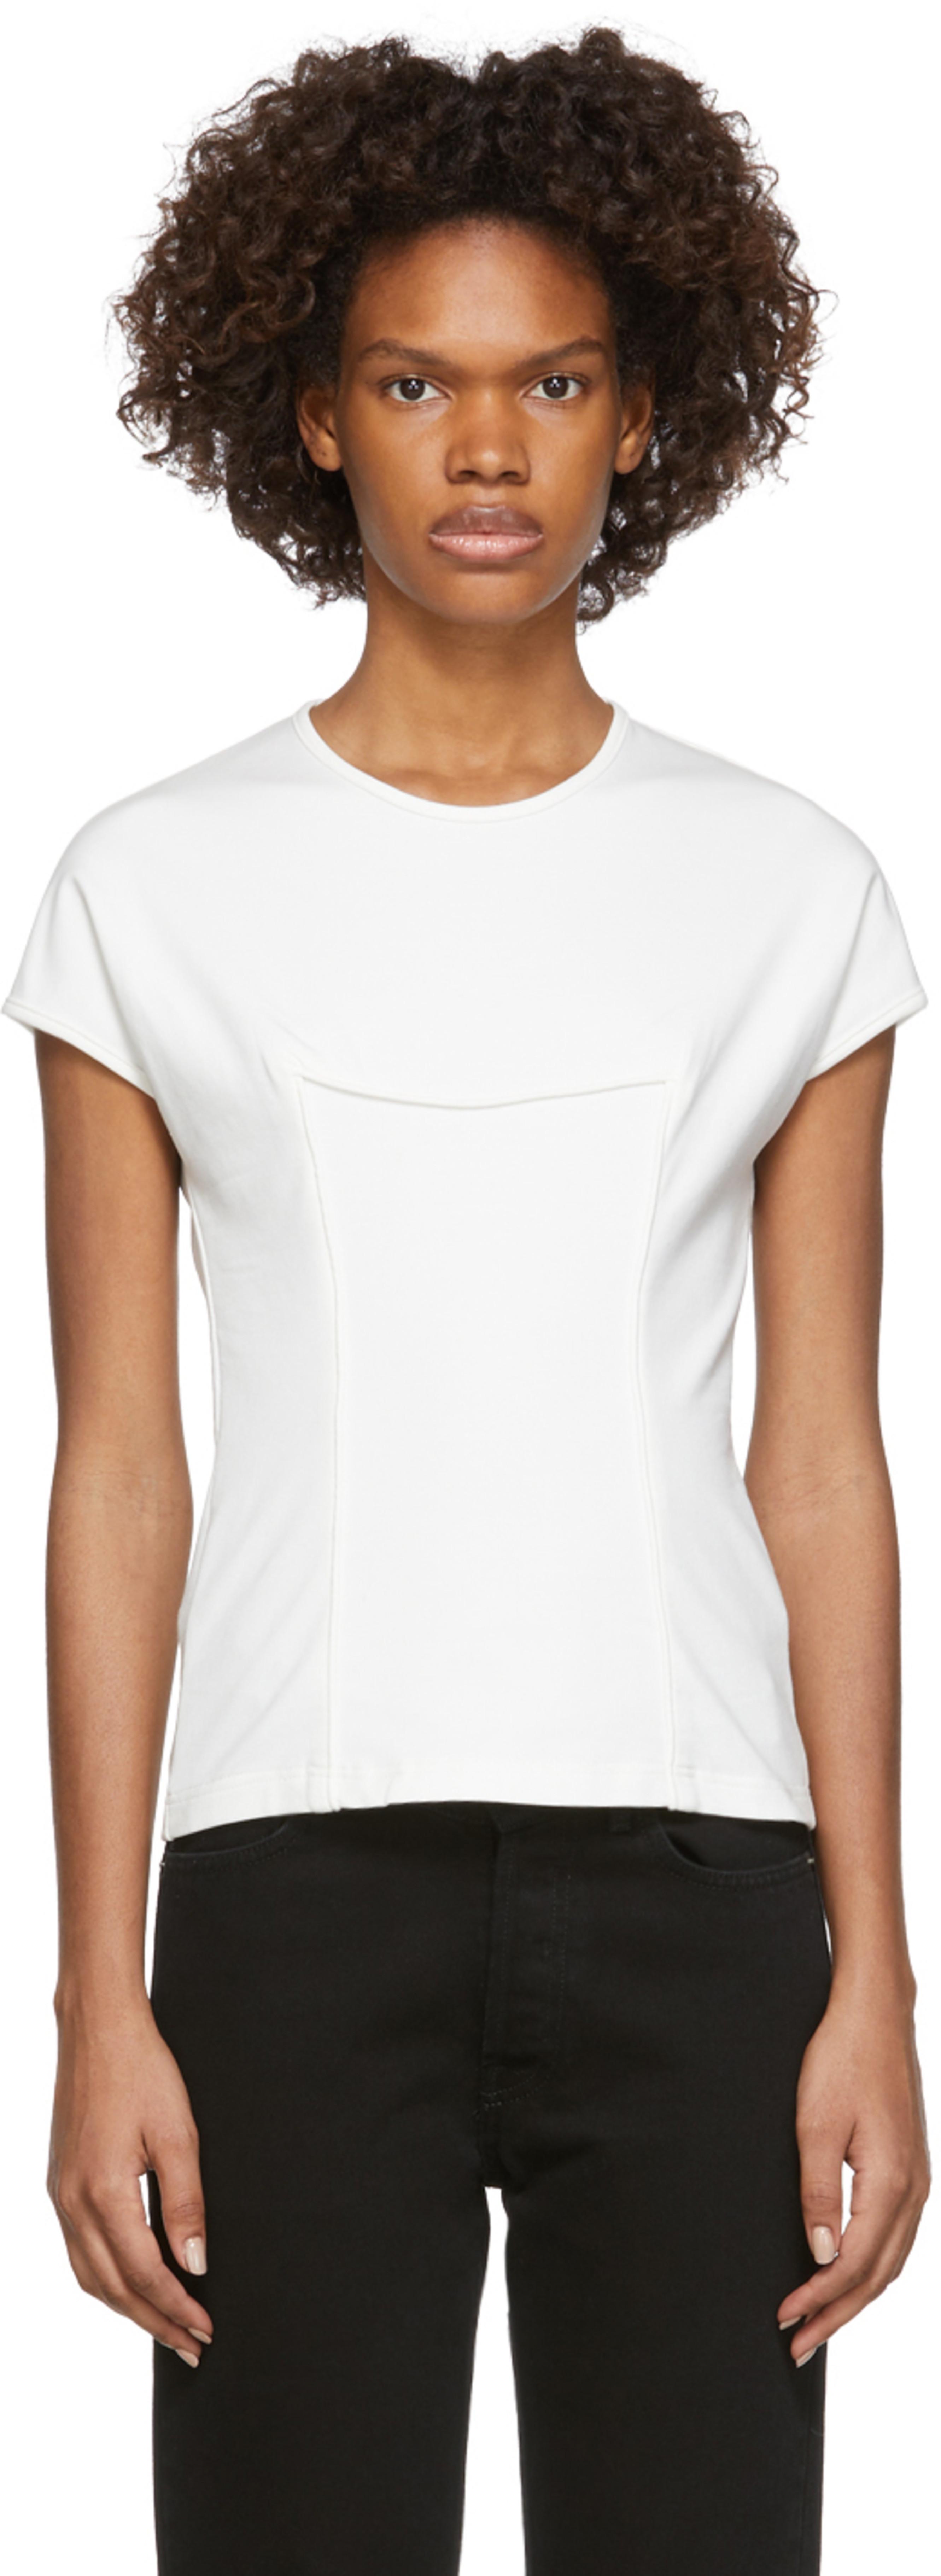 286e62b3f Designer Clothes